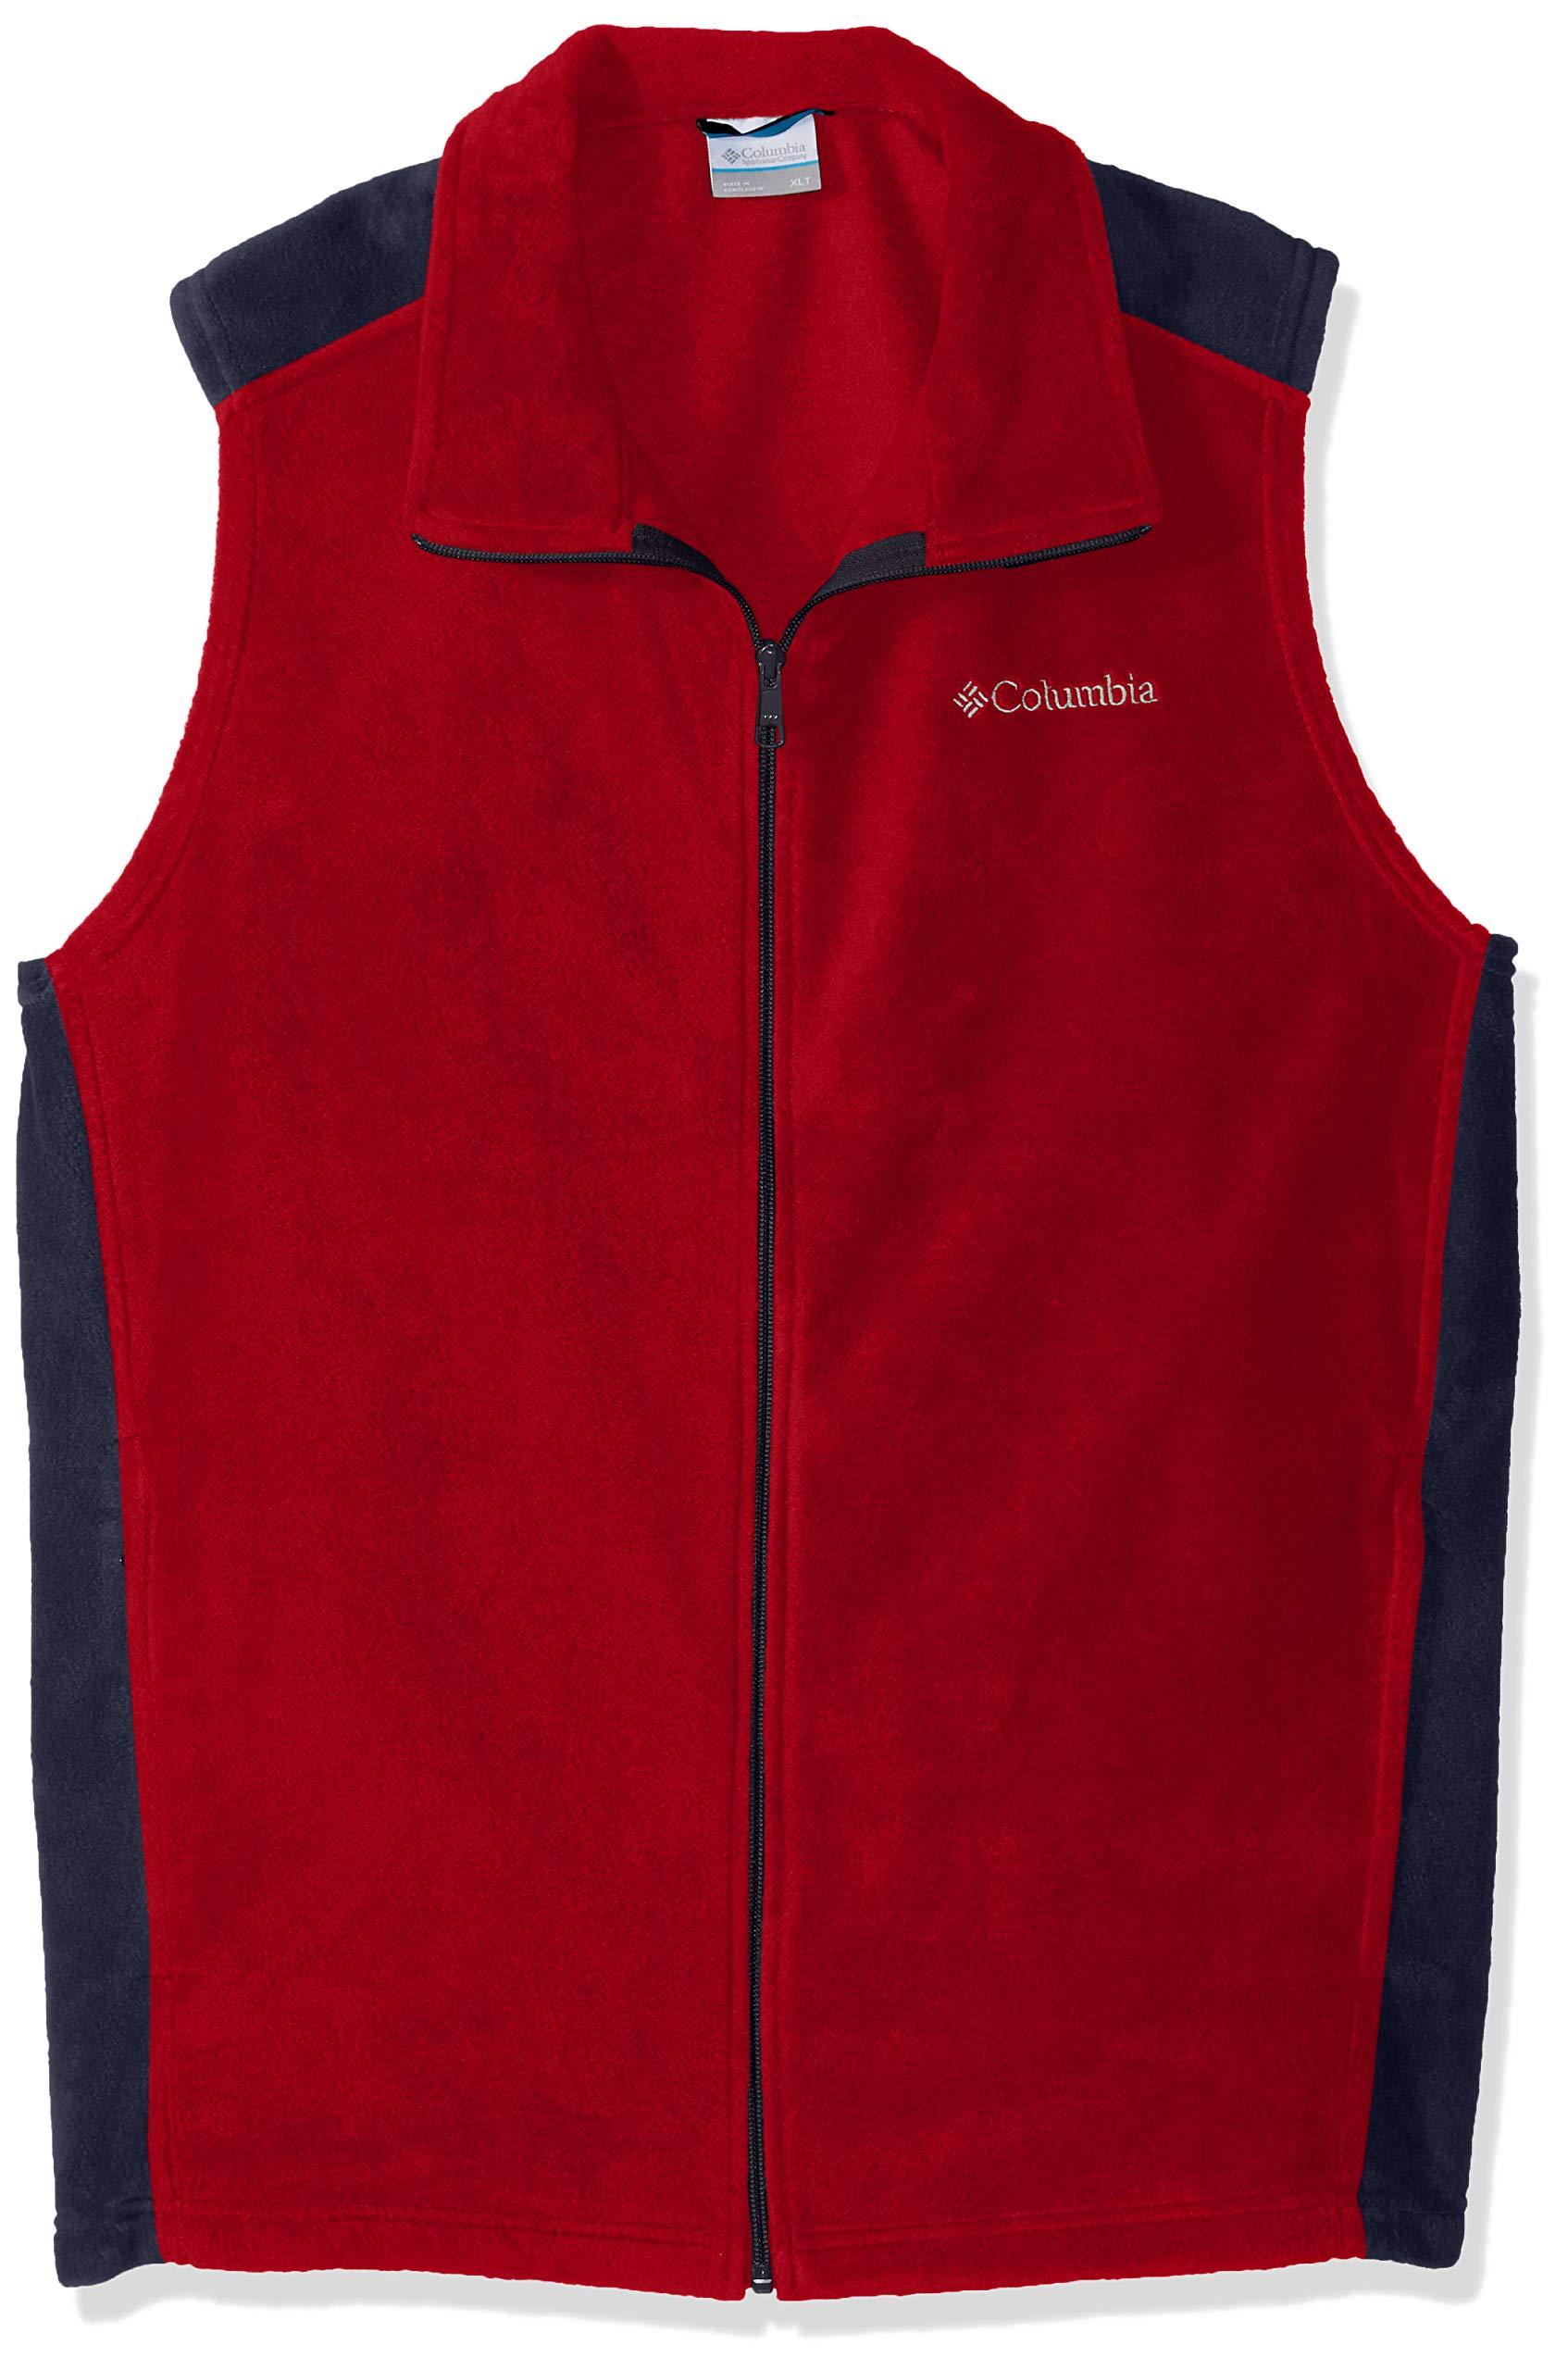 Columbia Men's Steens Mountain Vest, Red Spark, Collegiate Navy, M